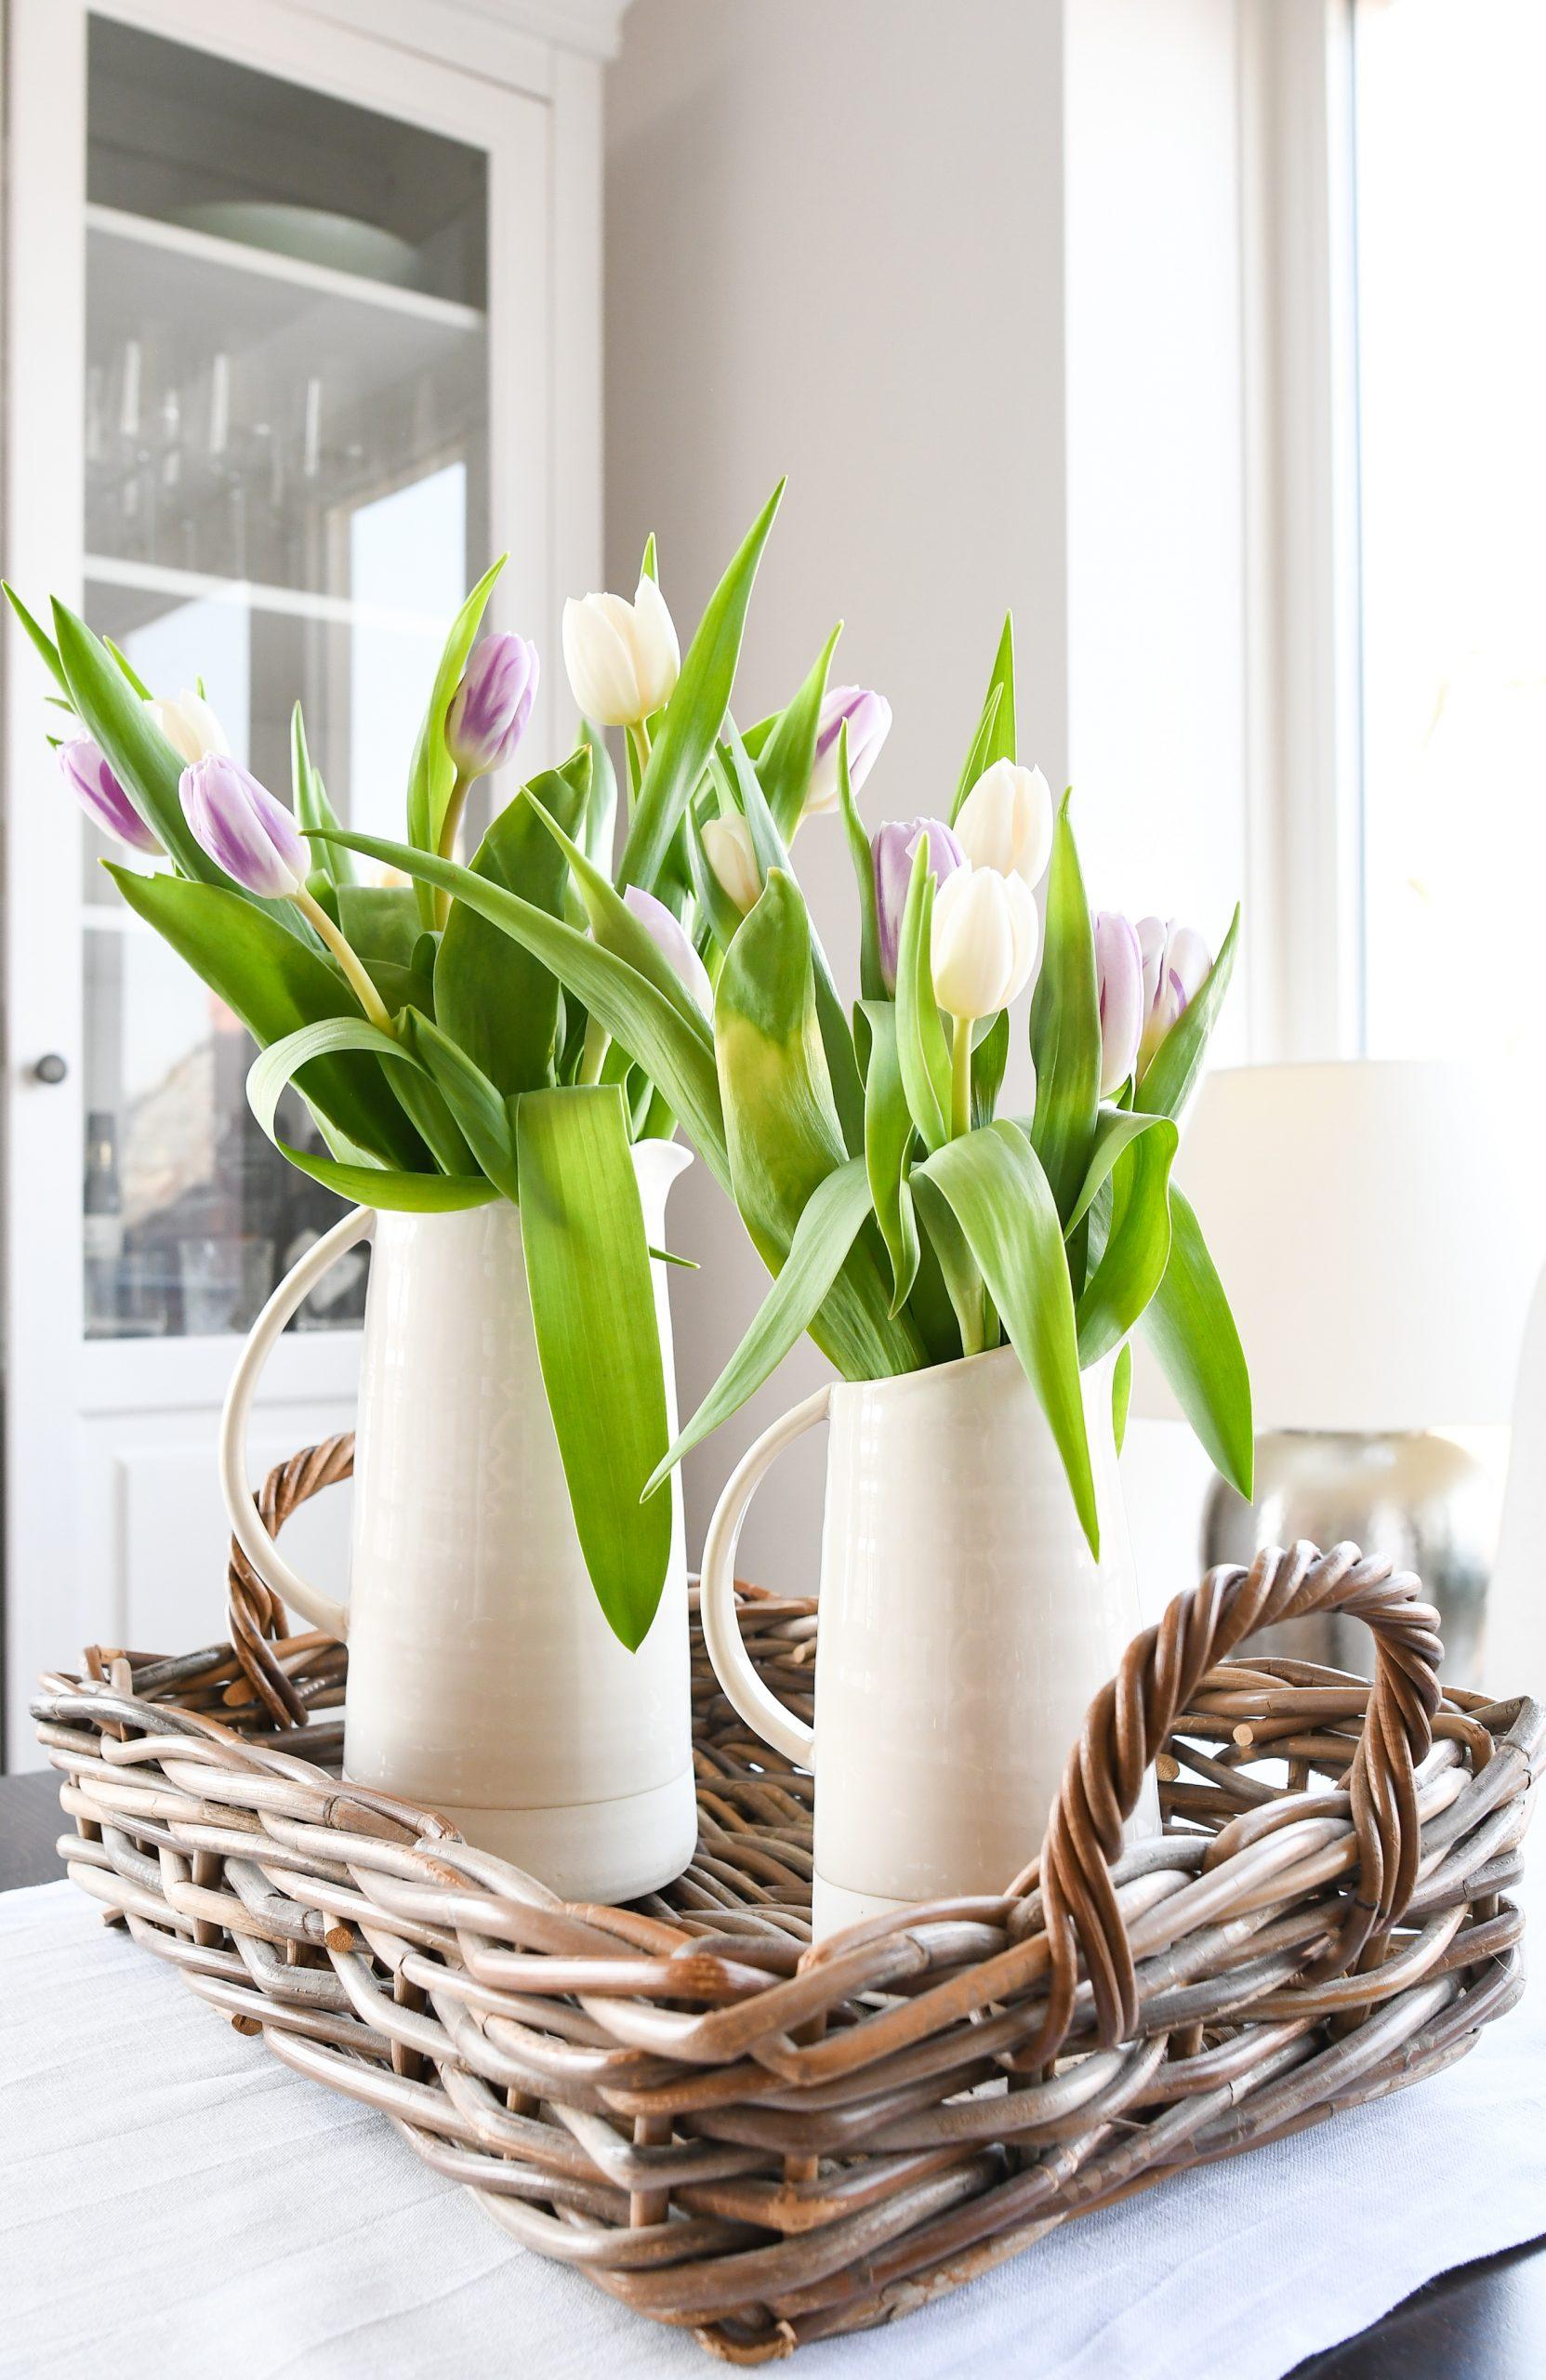 paastafel versieren ideetjes tulpen in kannen